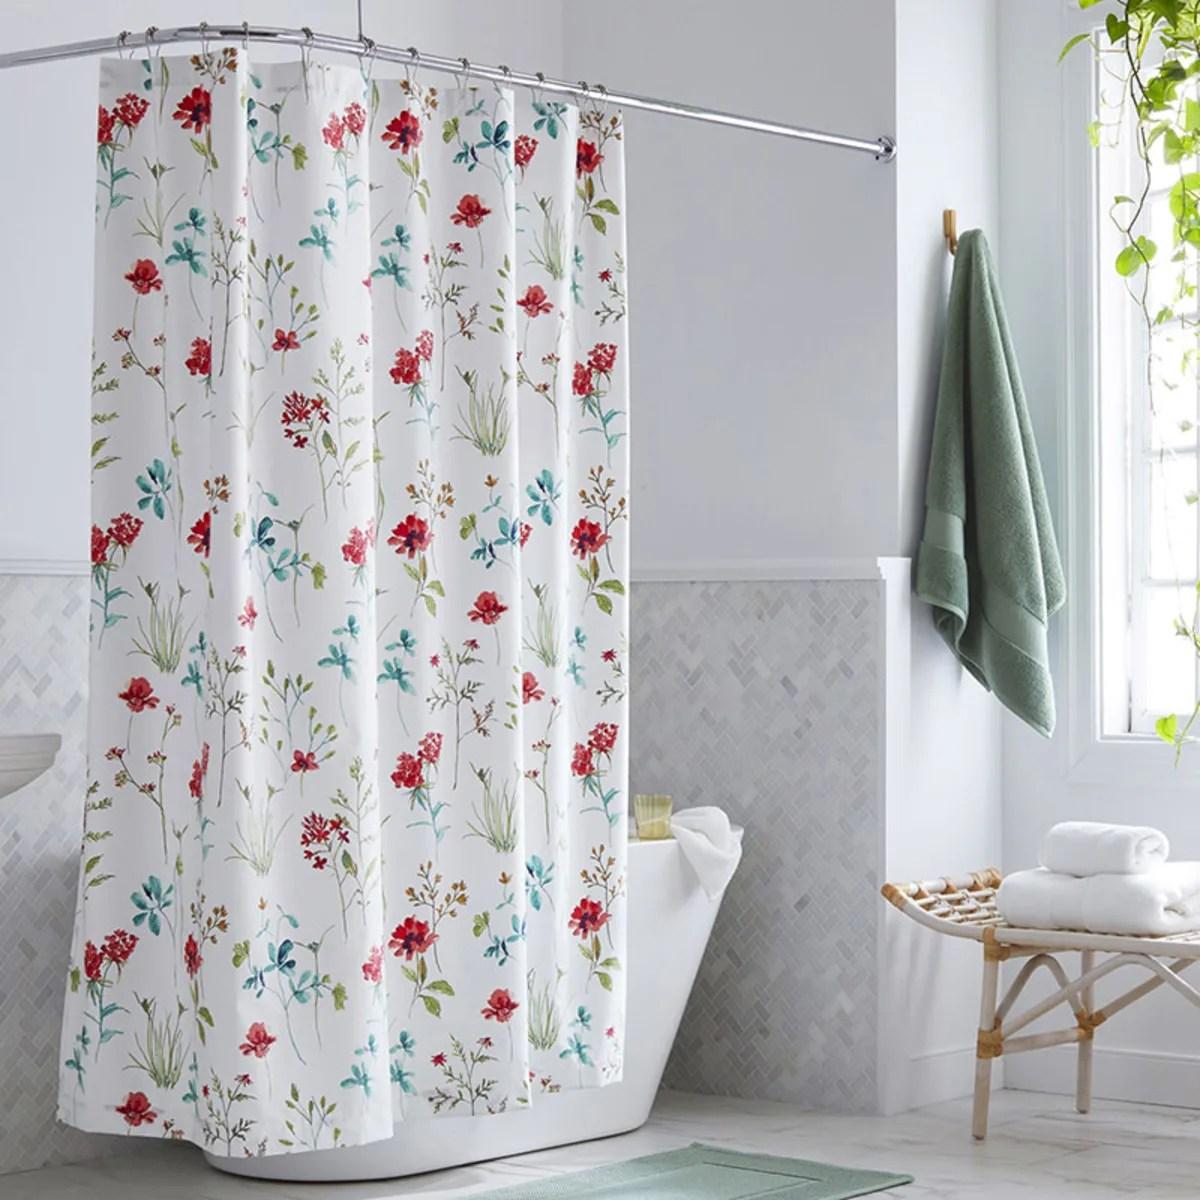 company cotton wildflower wrinkle free sateen shower curtain